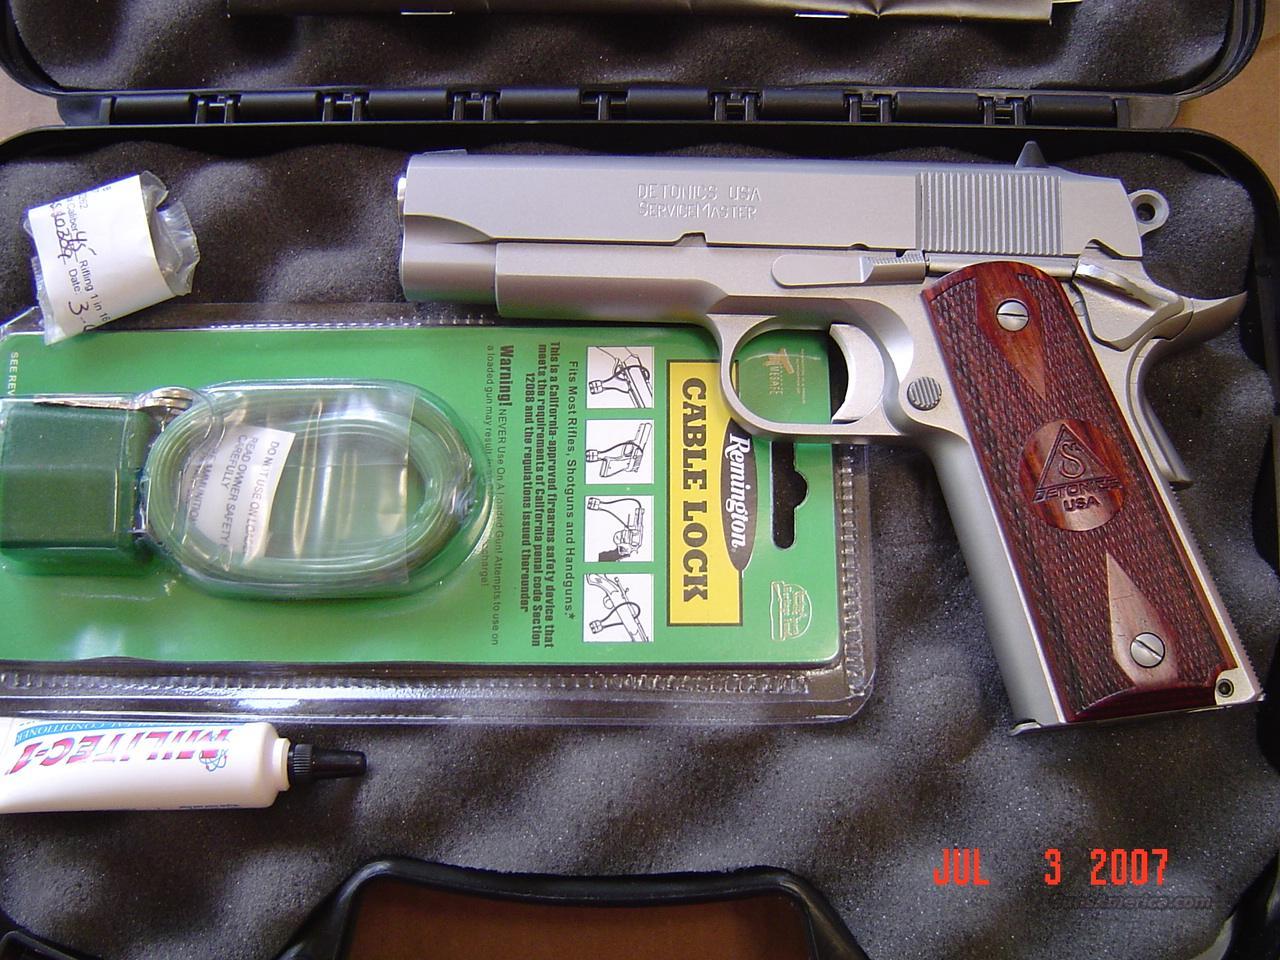 DETONICS 1911 SERVICE MASTER  Guns > Pistols > Detonics Pistols